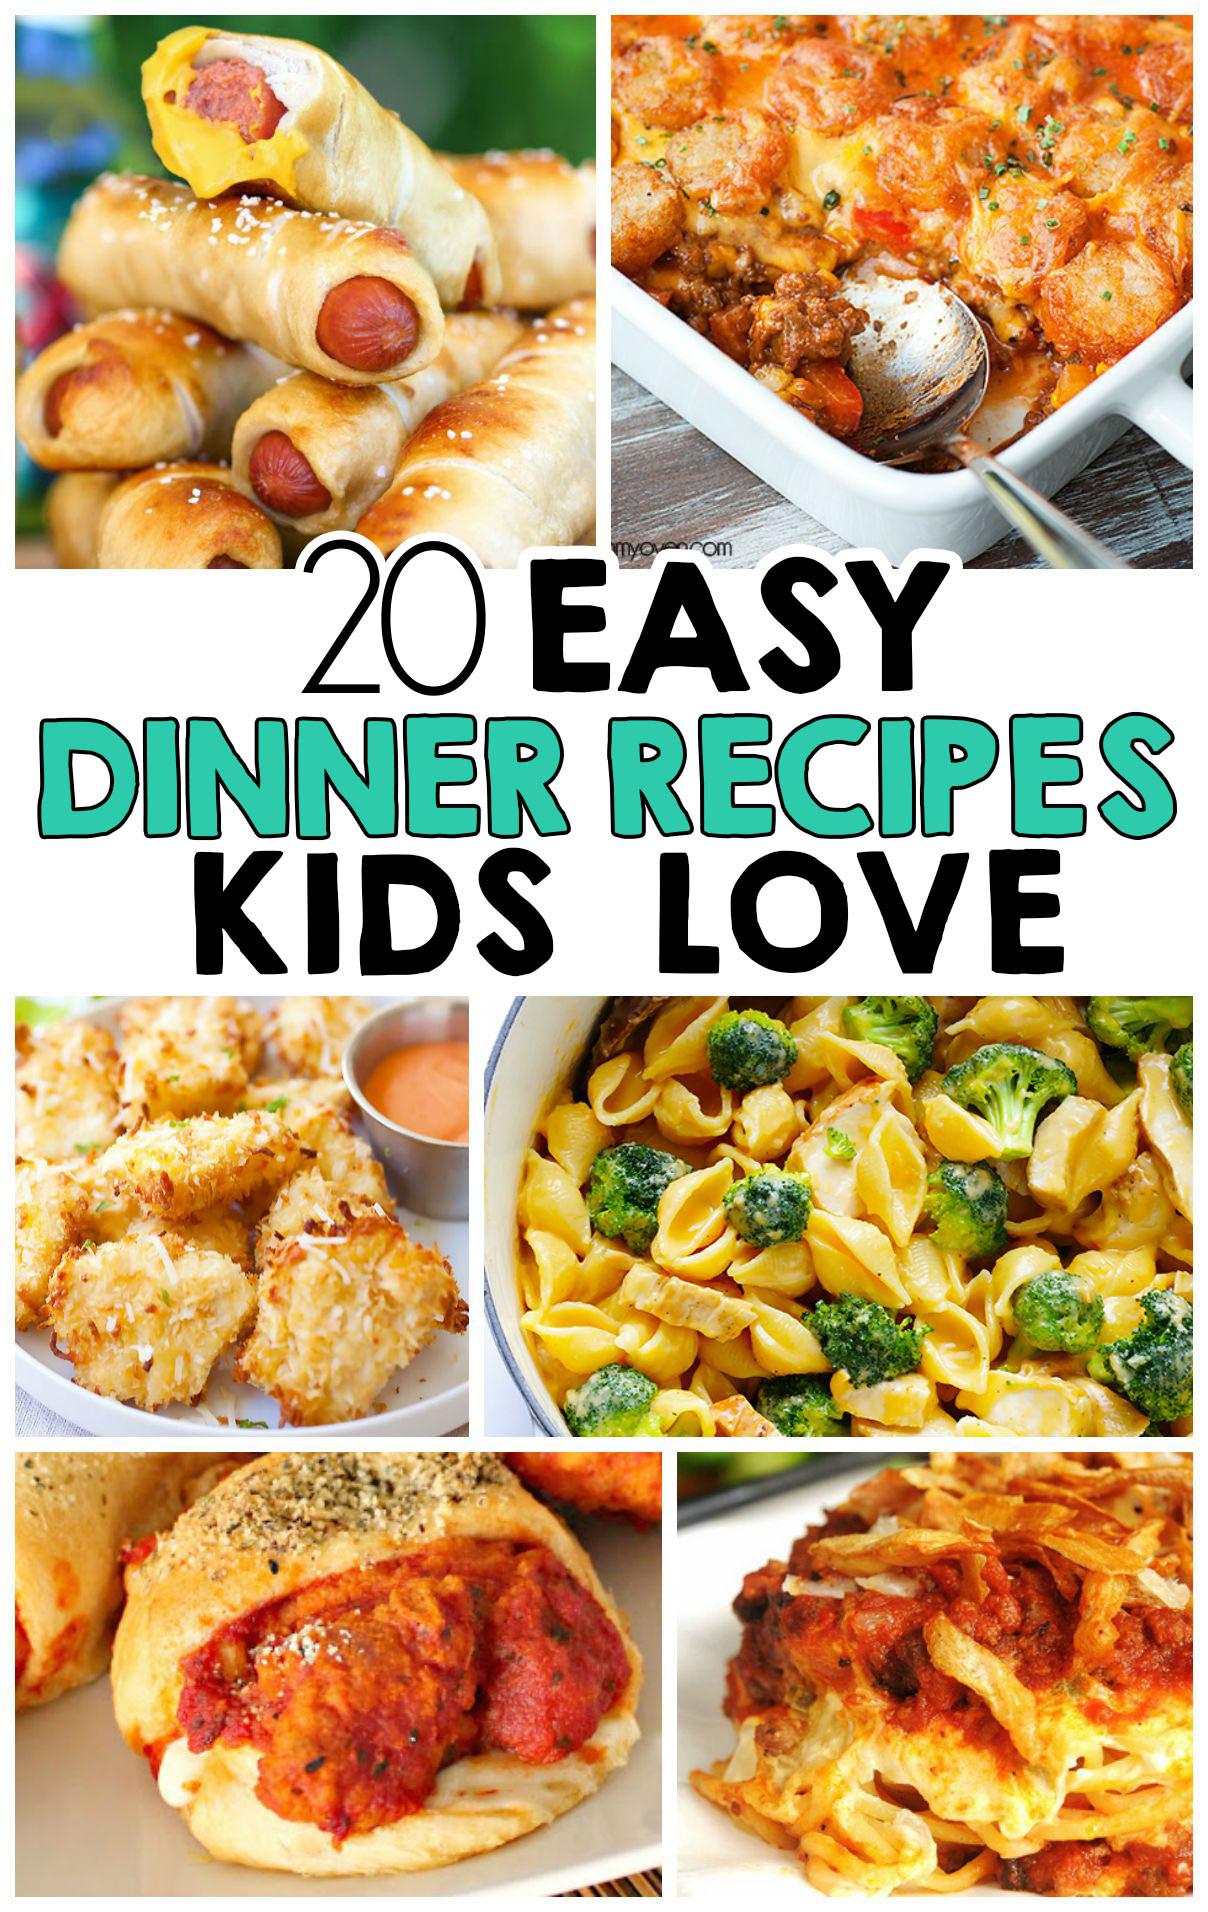 Dinner Ideas Easy  20 Easy Dinner Recipes That Kids Love I Heart Arts n Crafts